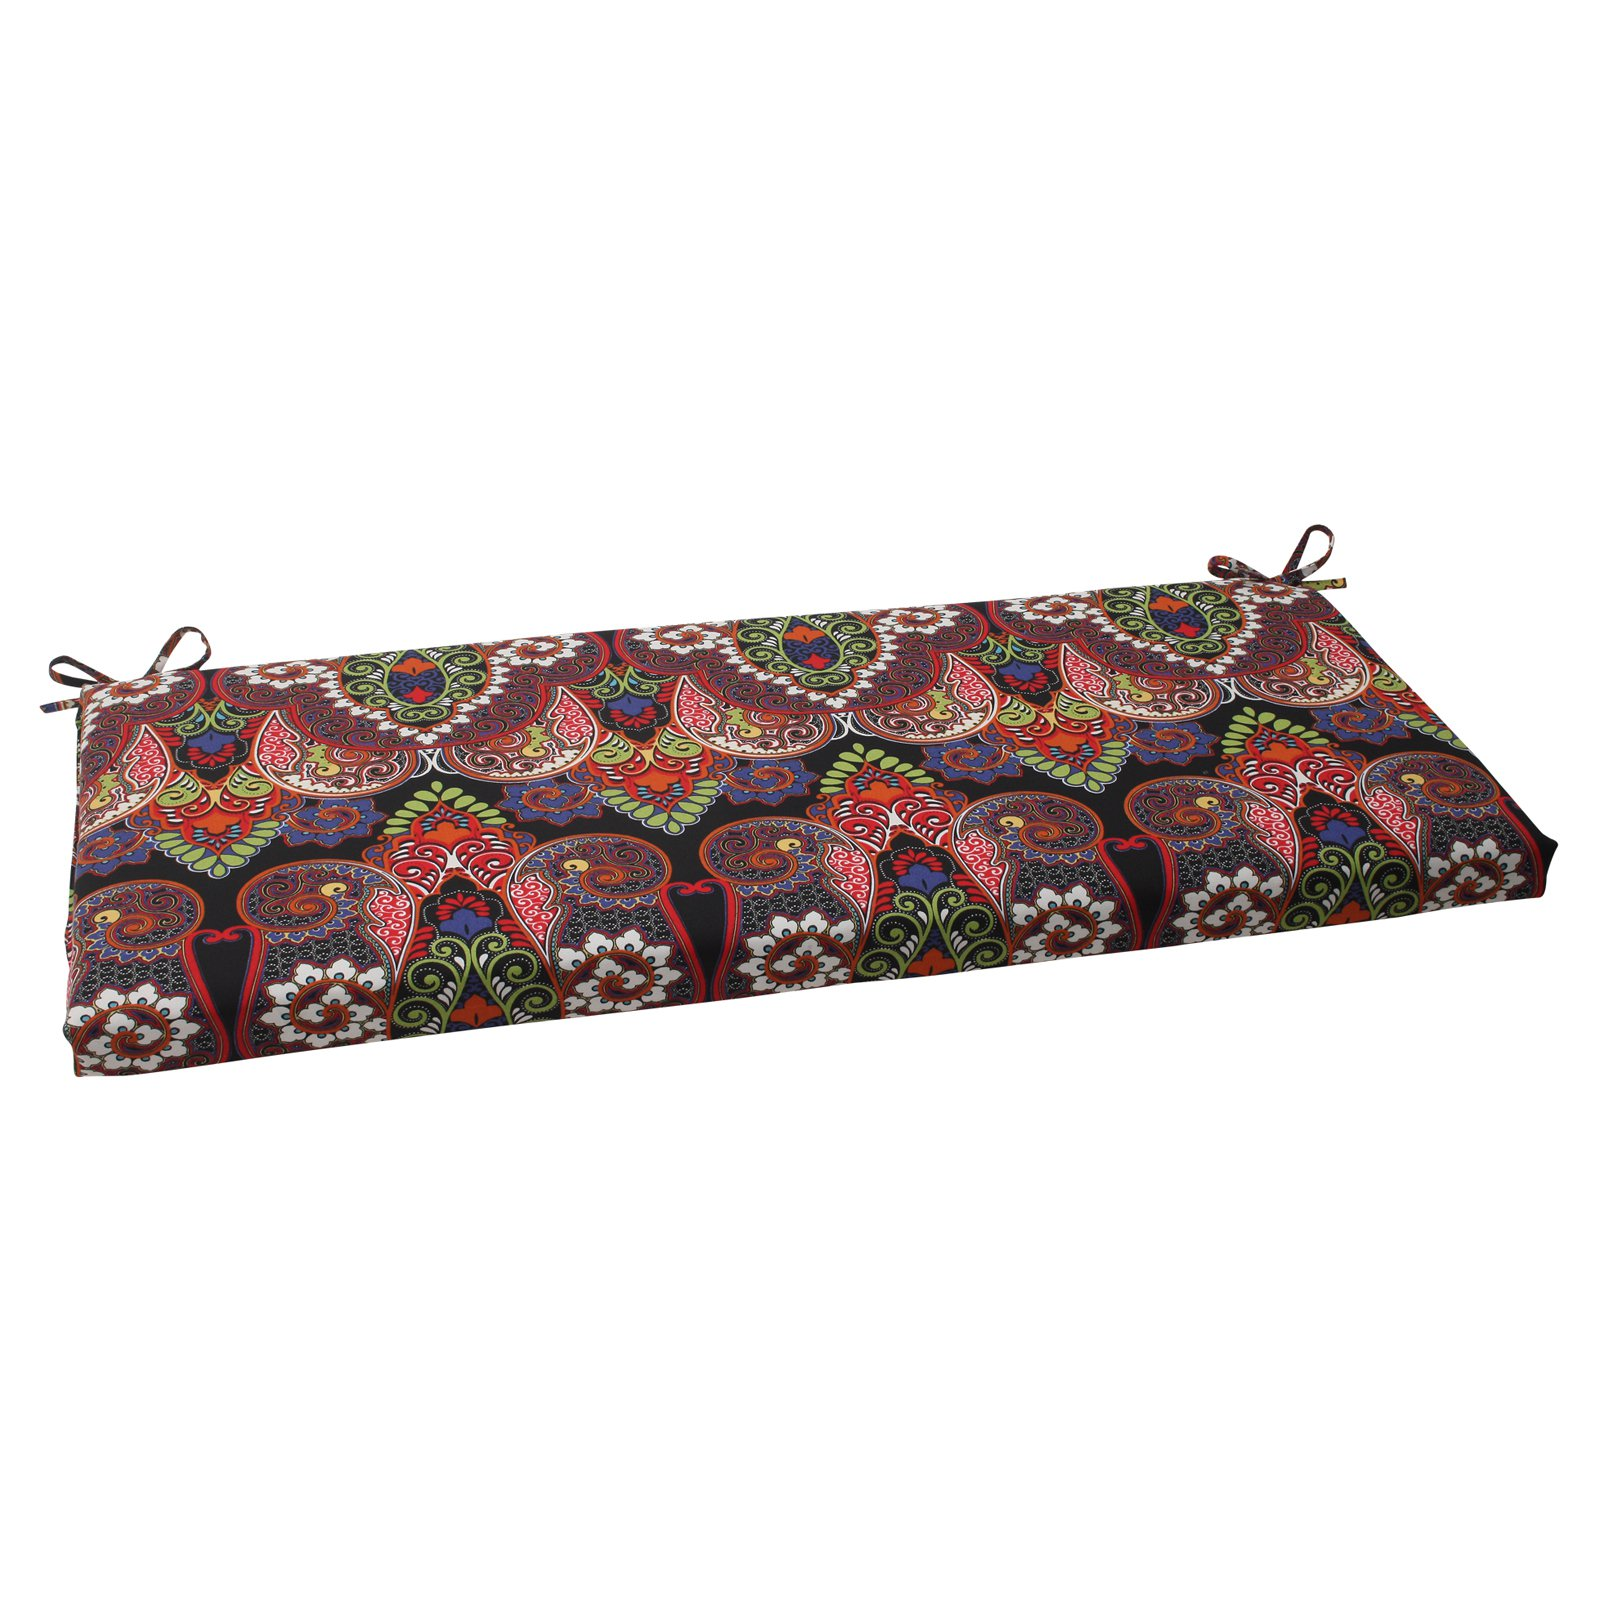 Pillow Perfect Outdoor/ Indoor Marapi Black Bench Cushion